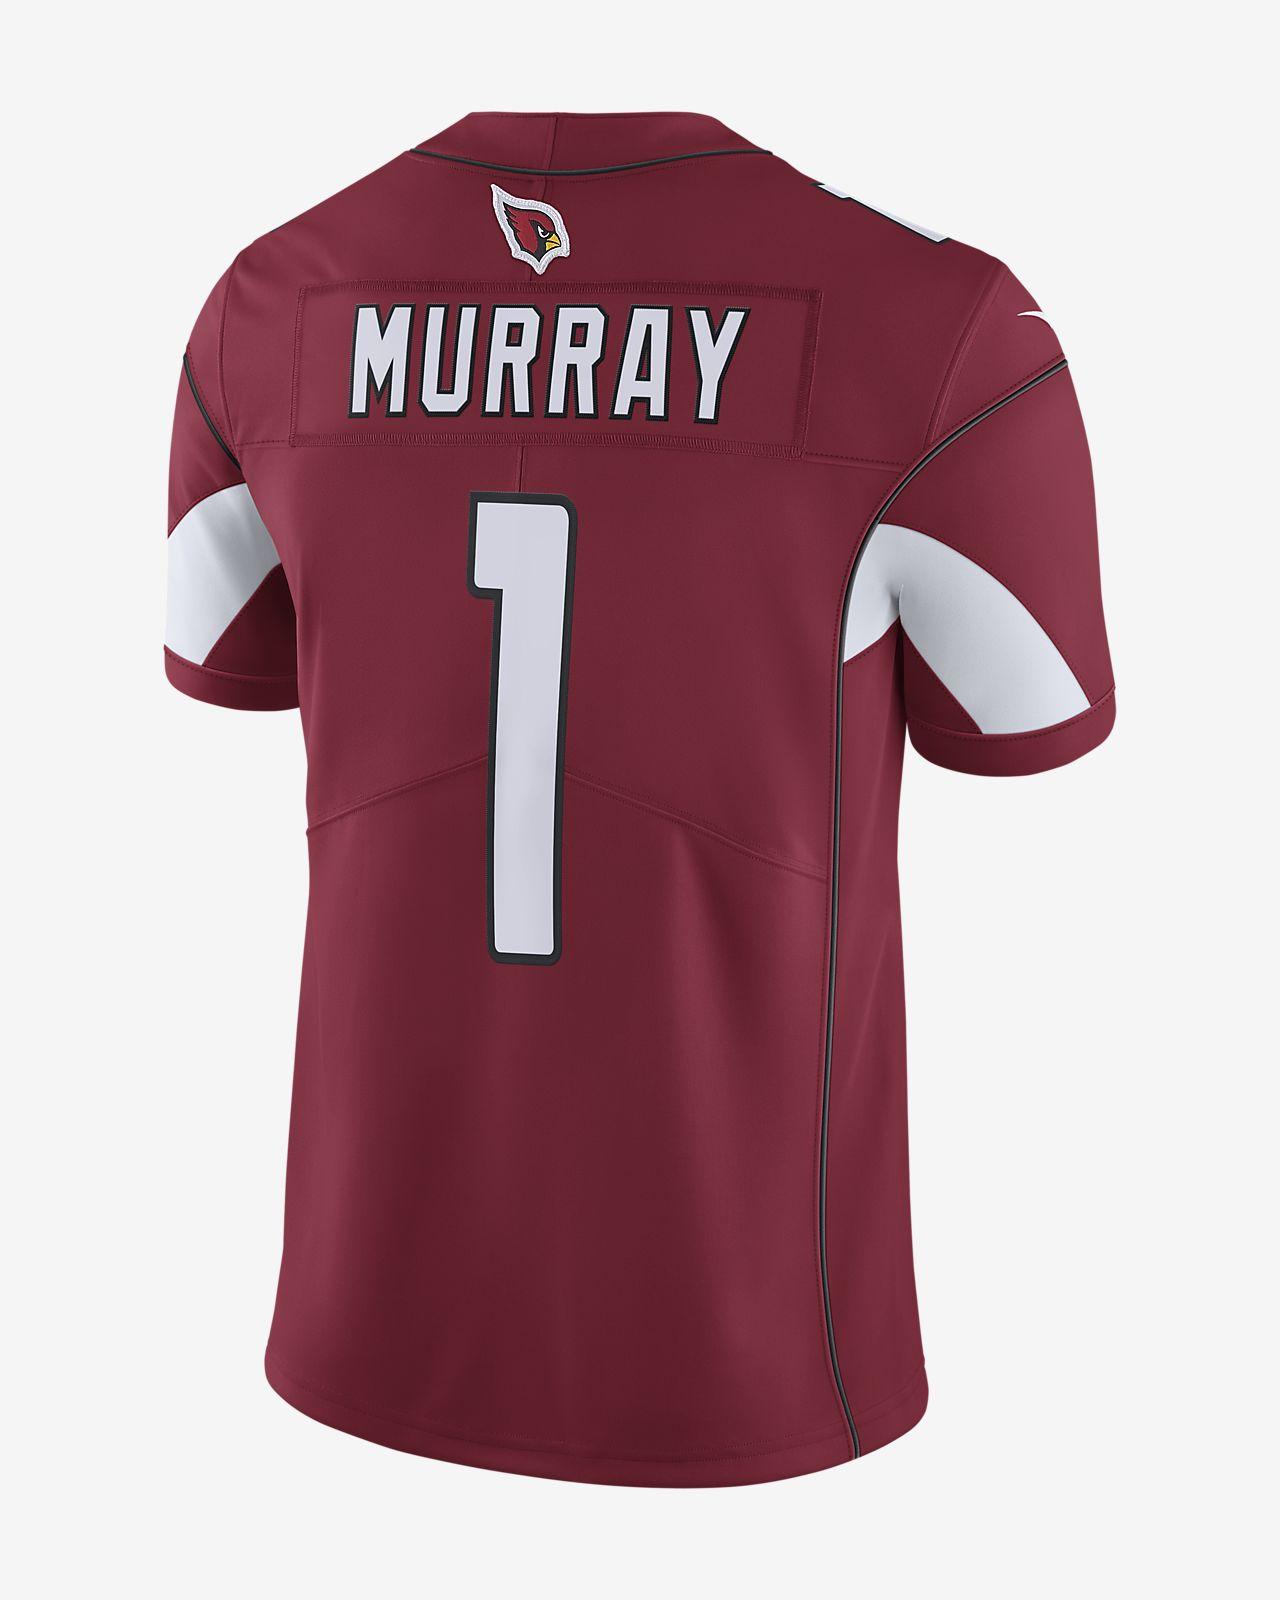 e596d2abb3c8 NFL Arizona Cardinals (Kyler Murray) Men s Limited Football Jersey ...